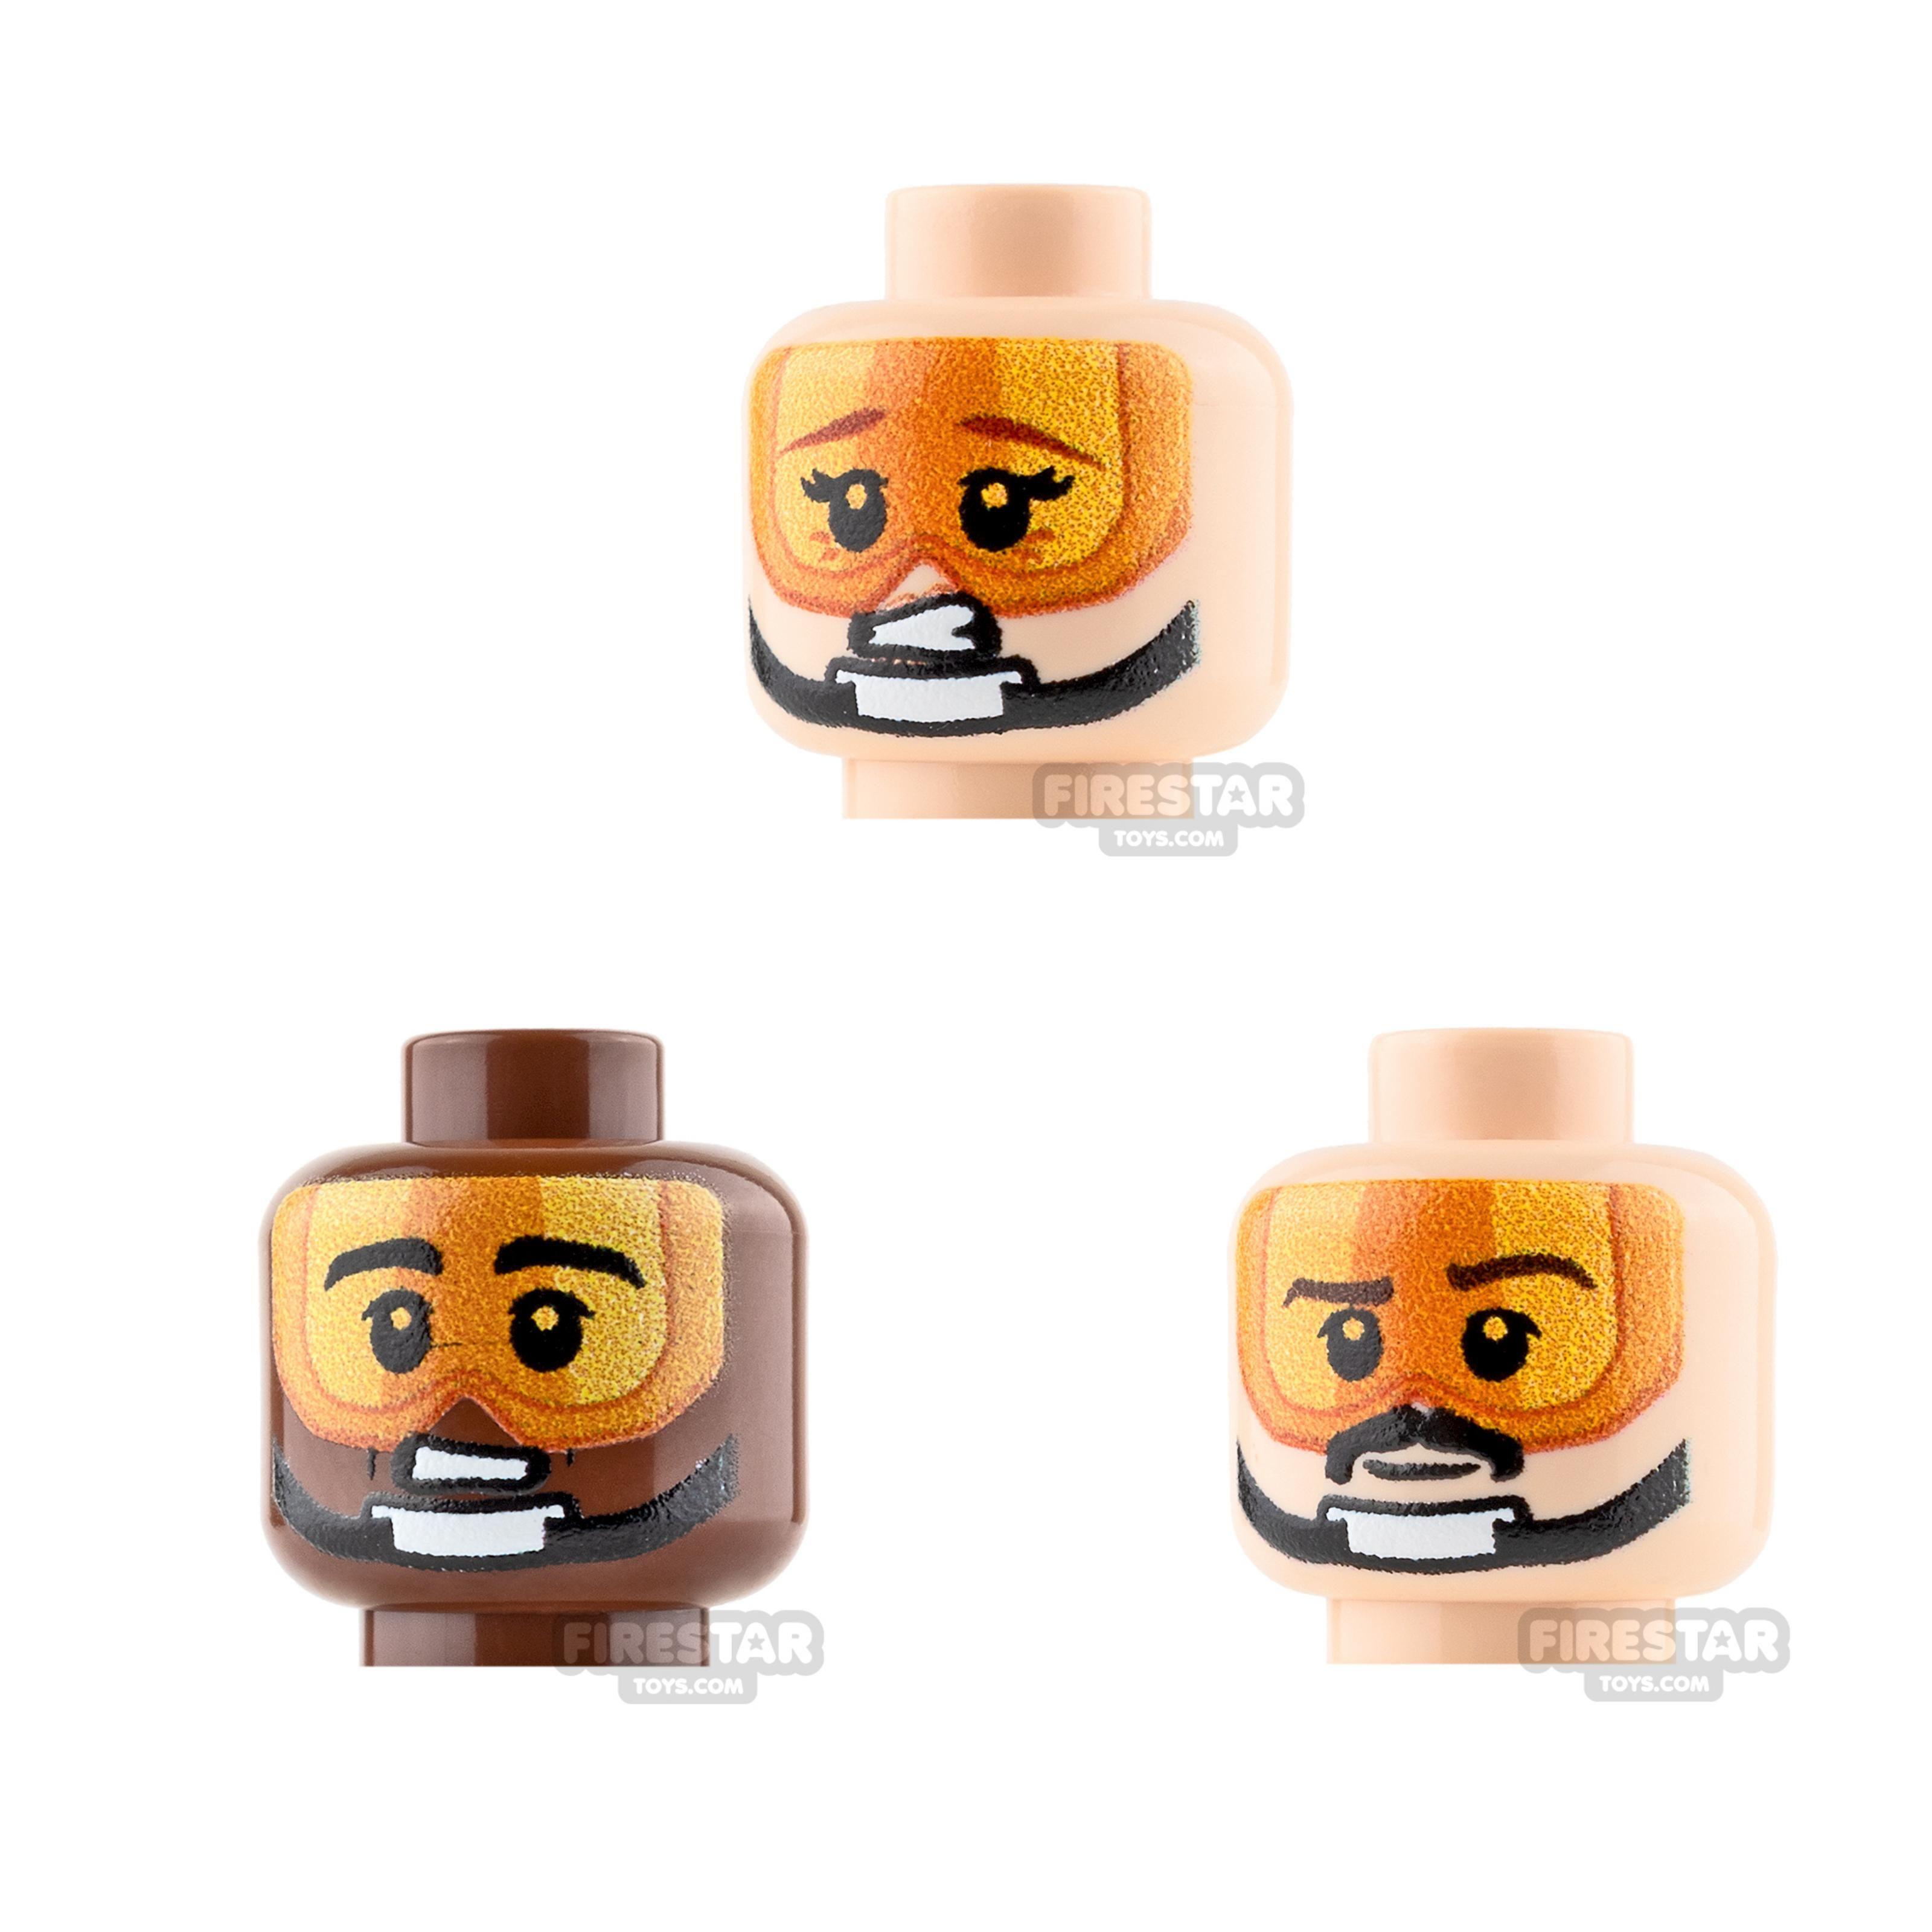 307483e1b32 LEGO Minifigures | LEGO Star Wars | LEGO Shop | LEGO Ninjago. New custom ...